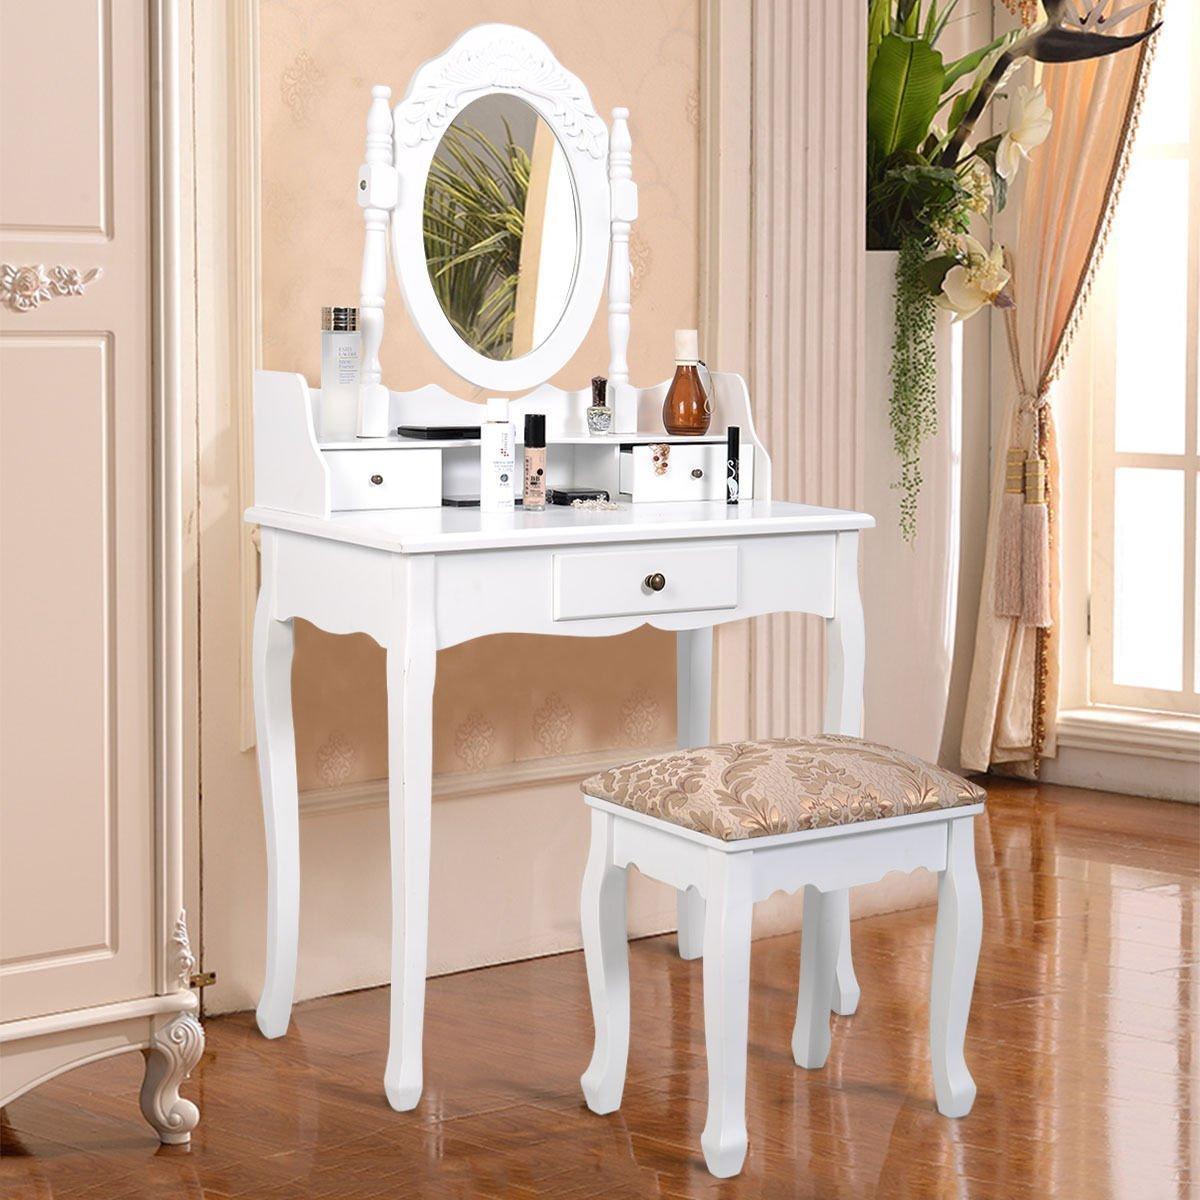 amazoncom giantex white vanity jewelry makeup dressing table set  - amazoncom giantex white vanity jewelry makeup dressing table set wstoolmirror wood desk ( drawers) kitchen  dining